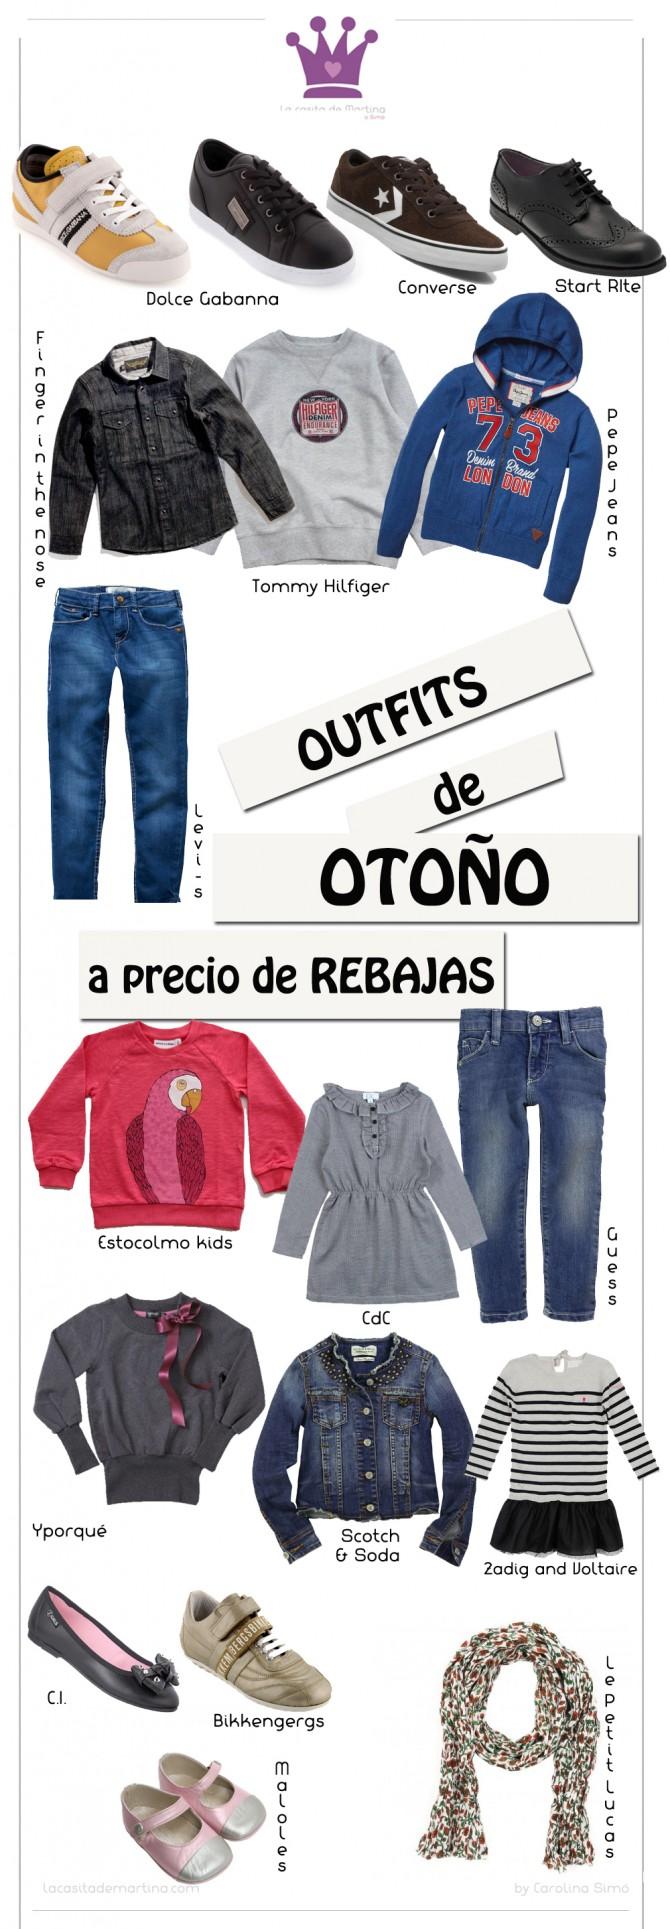 Estilismos moda infantil, La casita de Martina, Blog de Moda Infantil, Carolina Simó